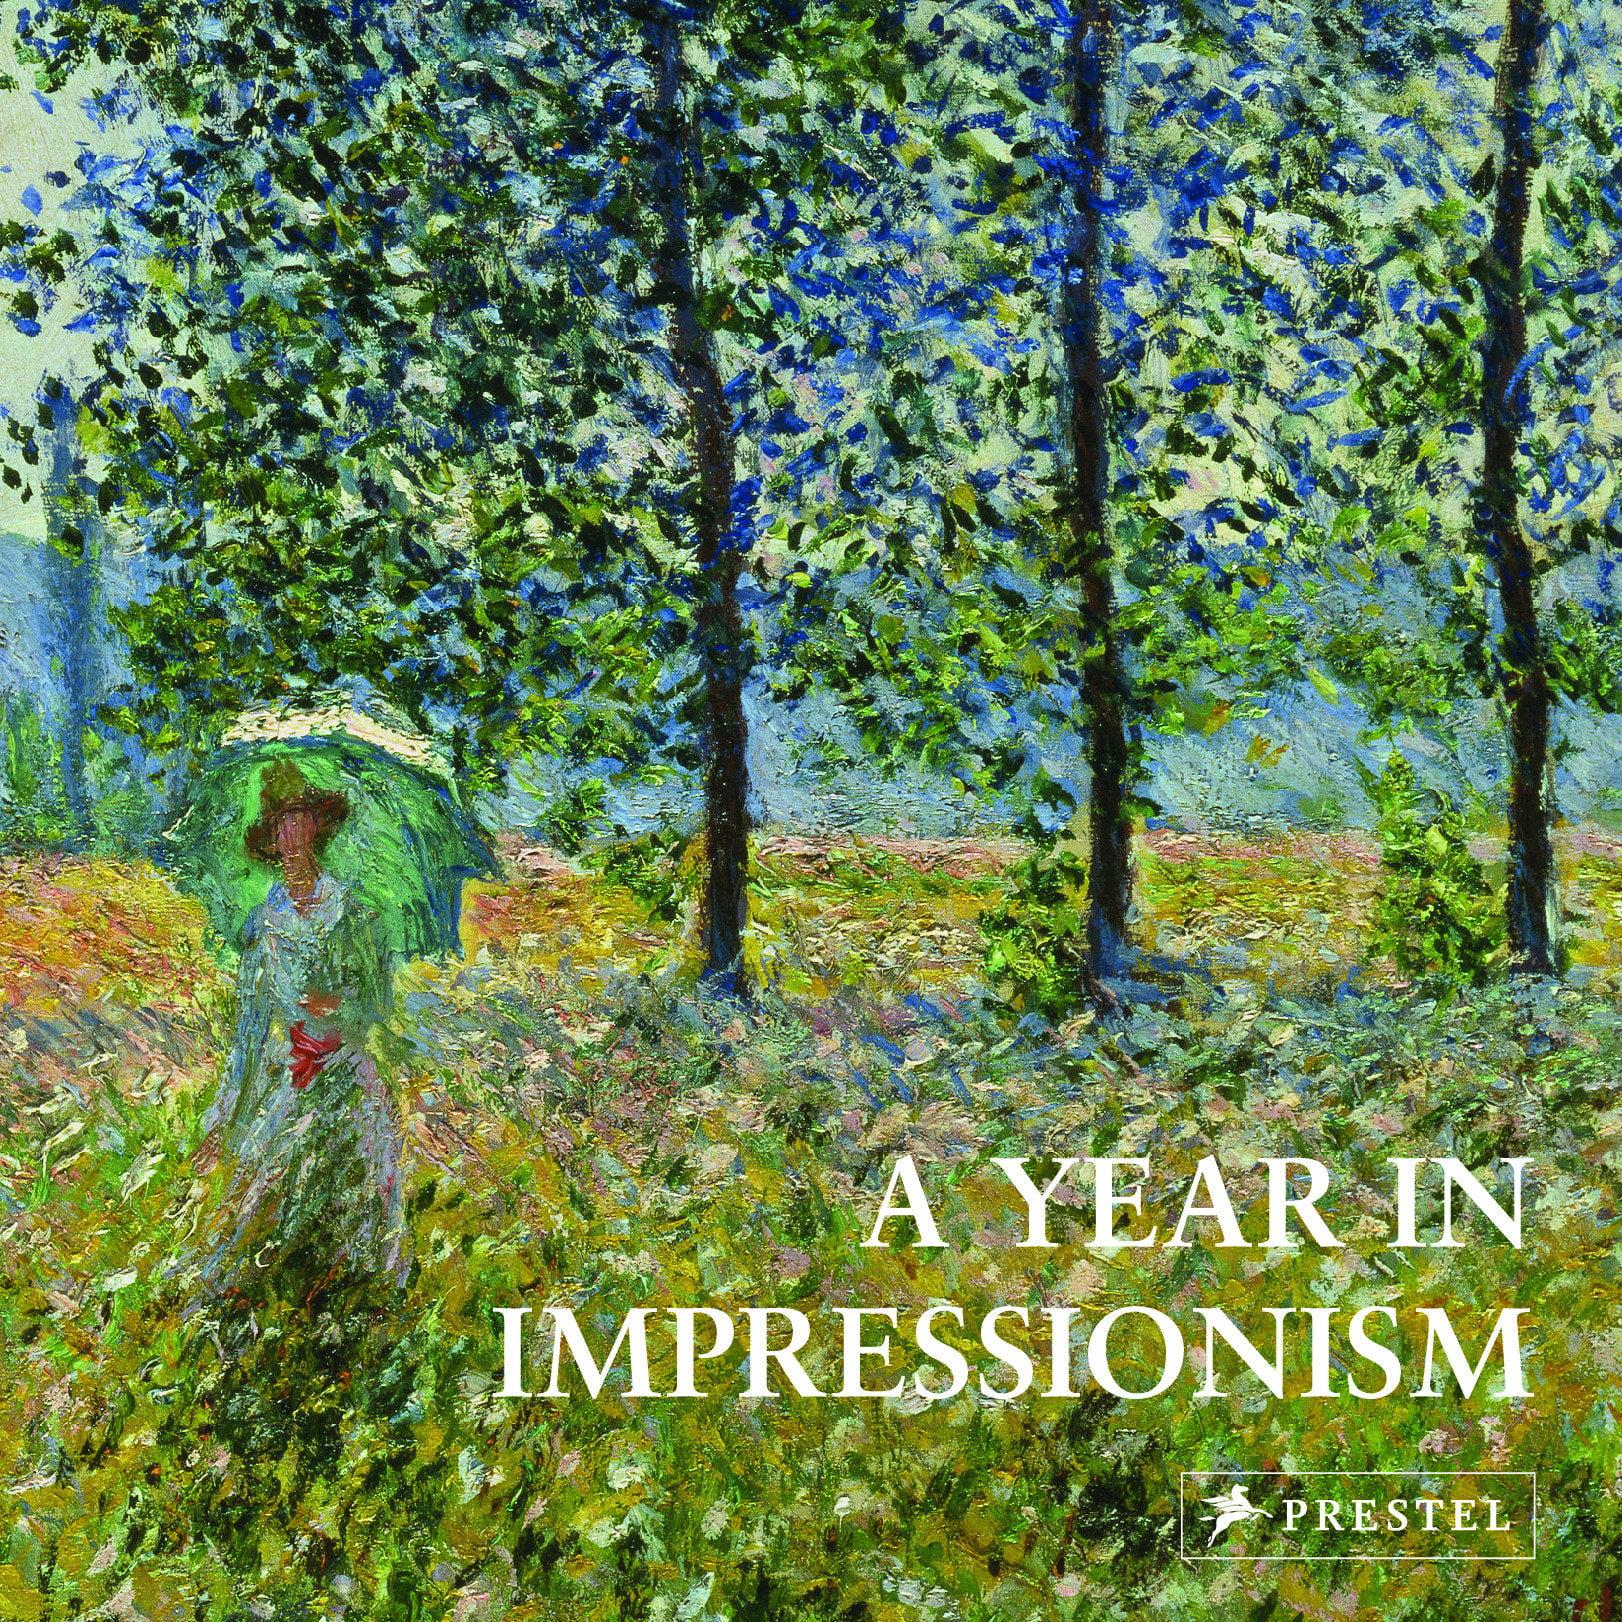 A Year in Impressionism